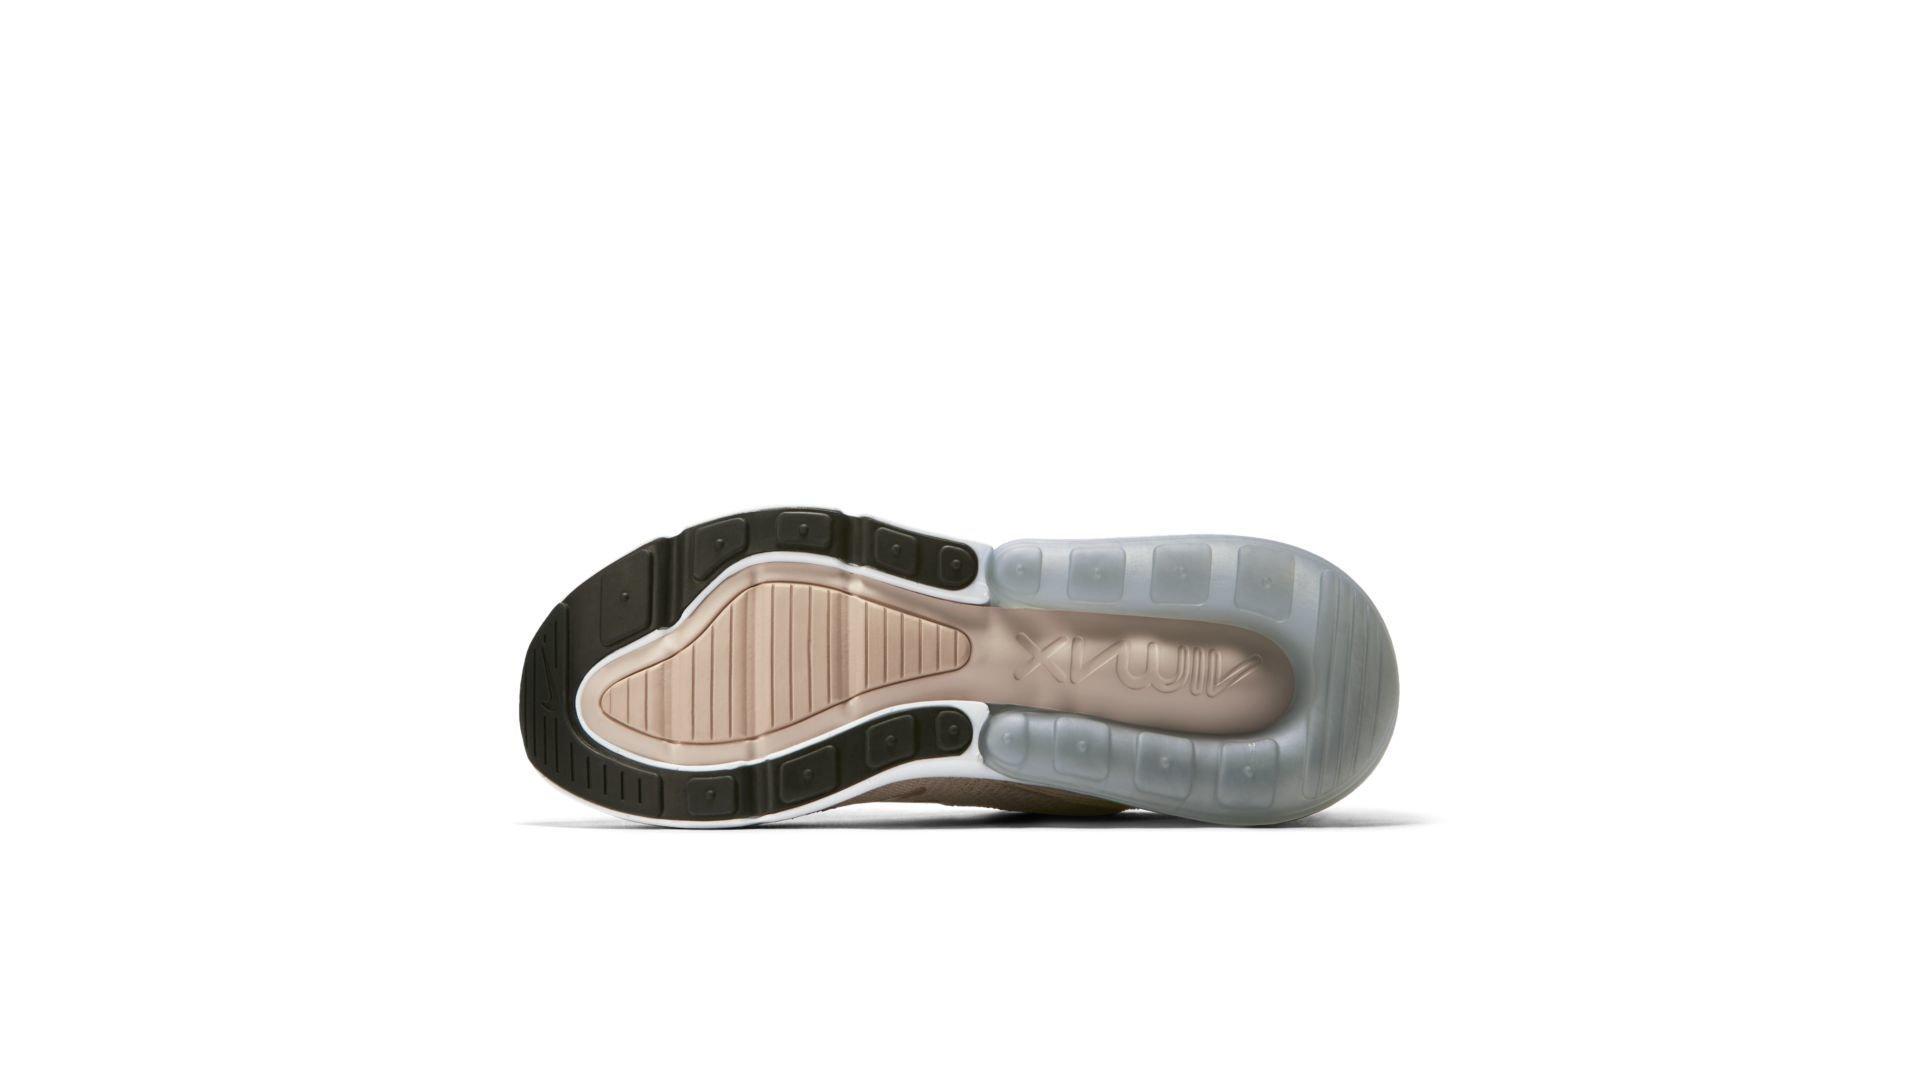 Nike Air Max 270 Flyknit (AH6803-801)